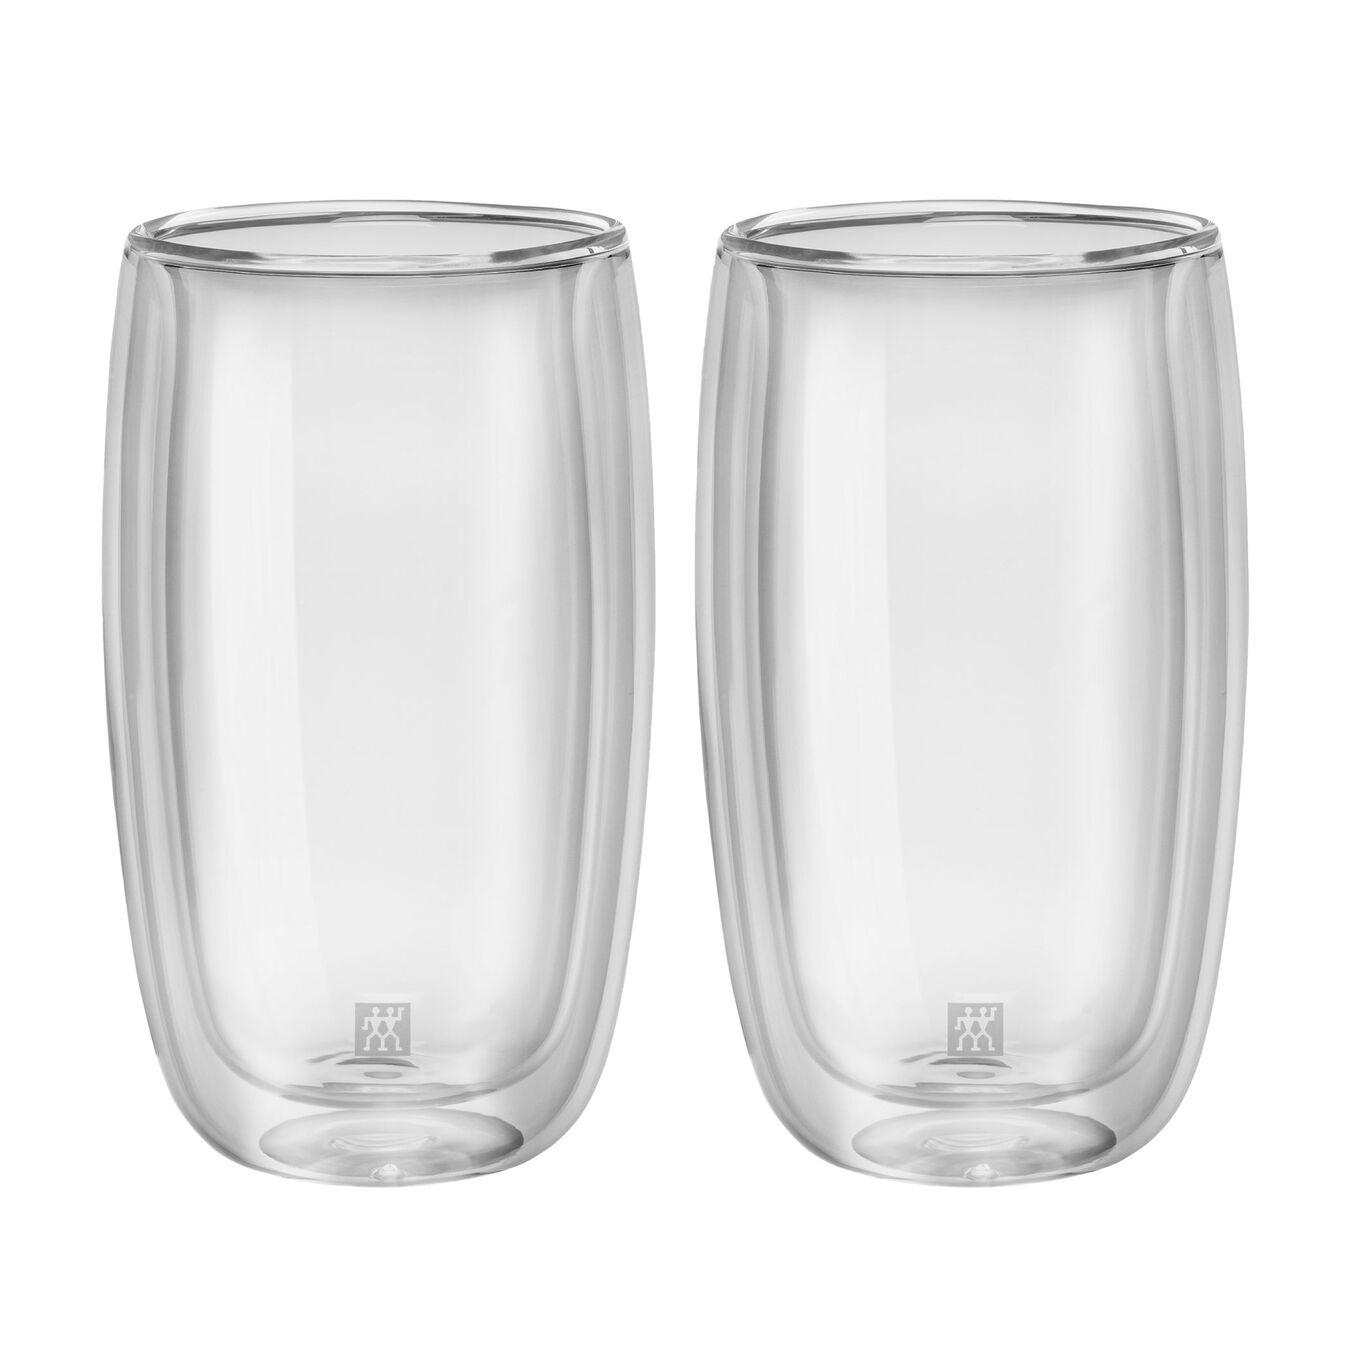 Latte Macchiato Glasset 350 ml,,large 1